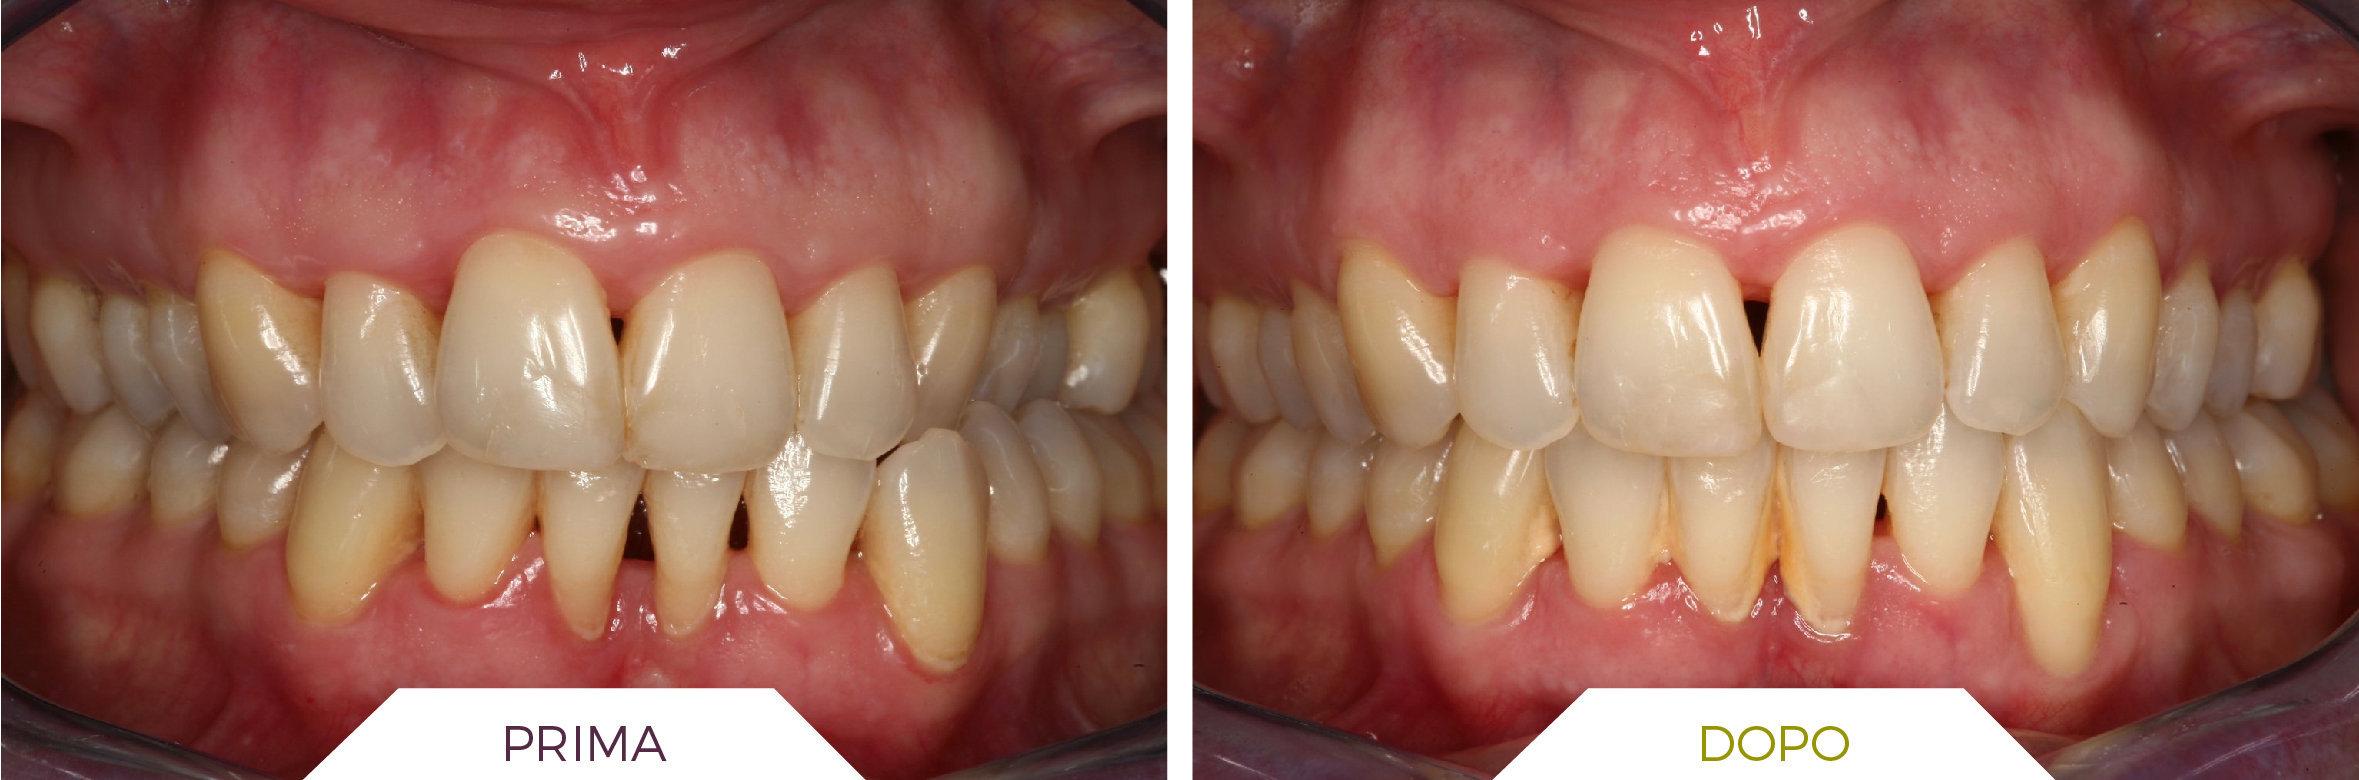 Inlaser- Ortodonzia-06